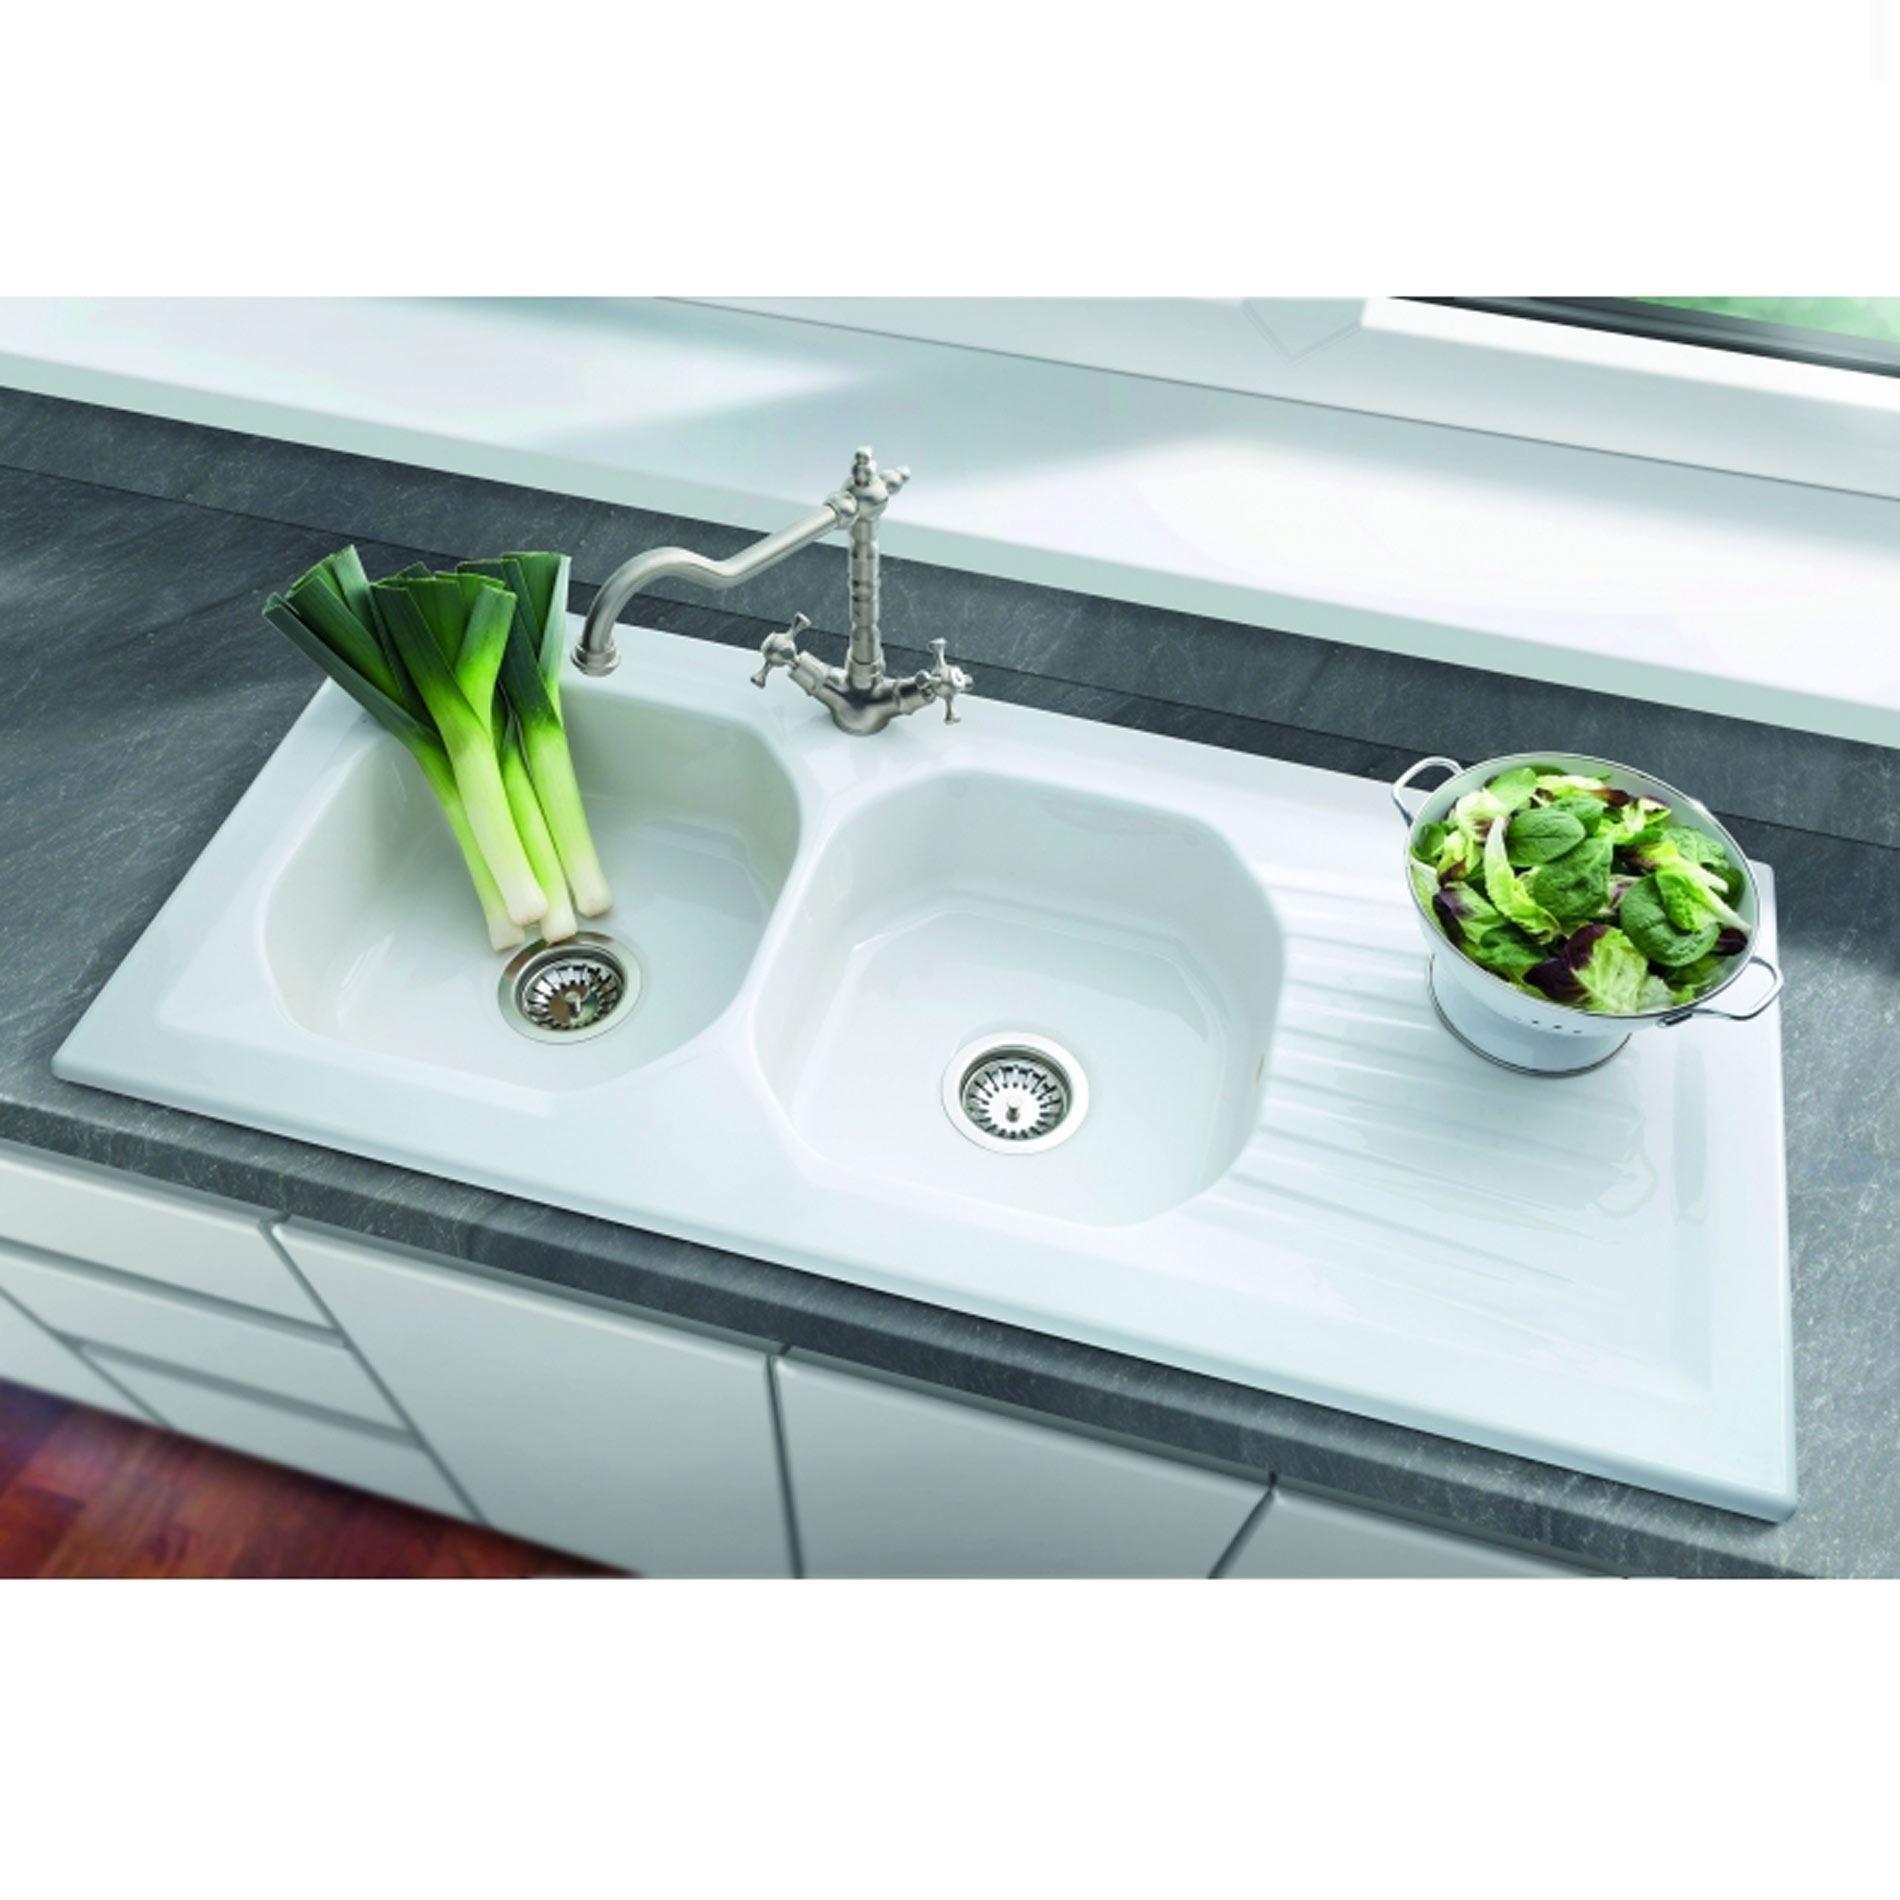 kitchen sinks taps villeroy boch ravel 2 0 bowl ceramic sink